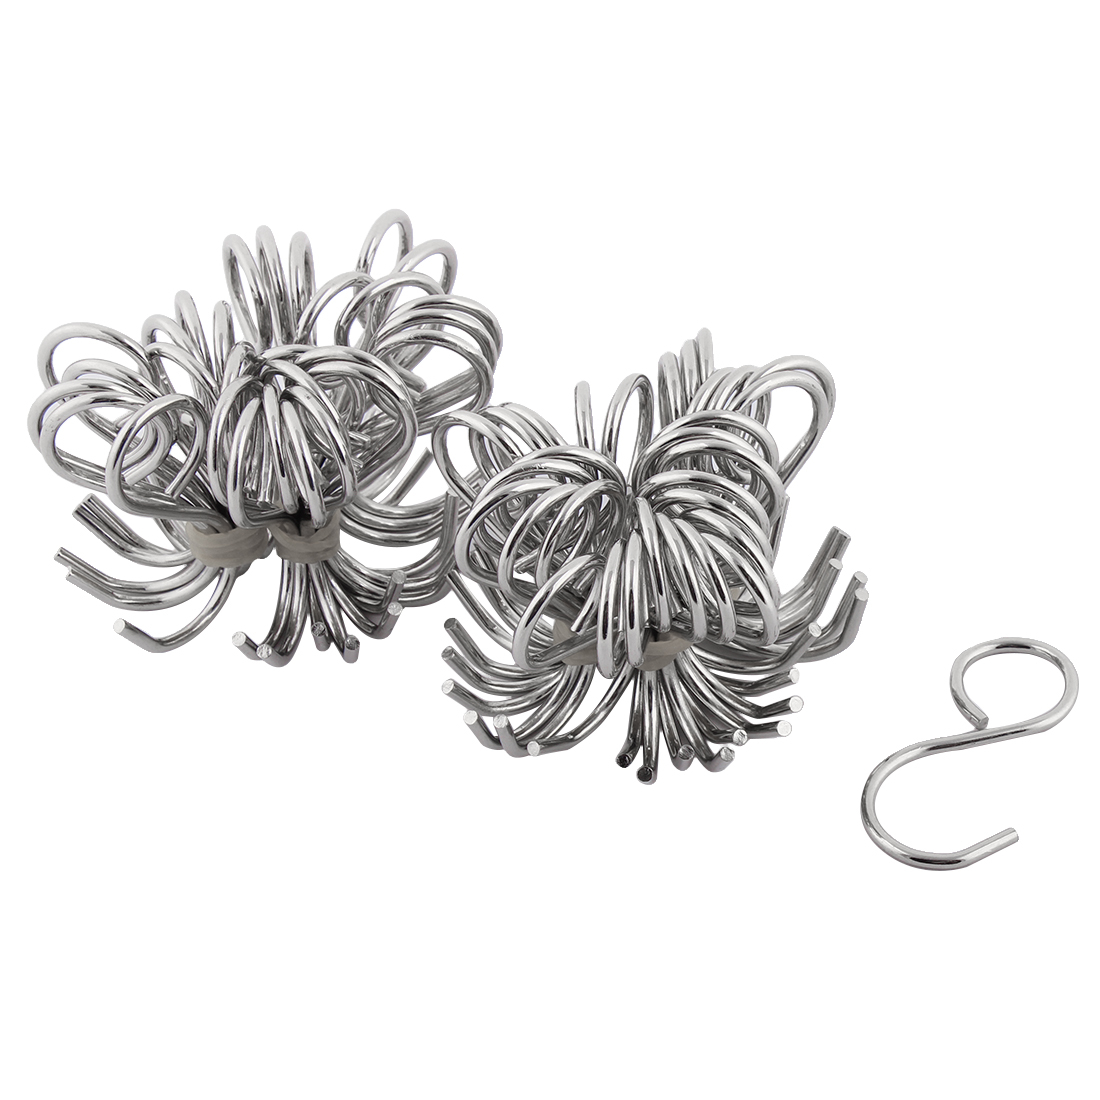 Household Bathroom Kitchen Metal S Shape Hanger Hook Silver Tone 60 Pcs